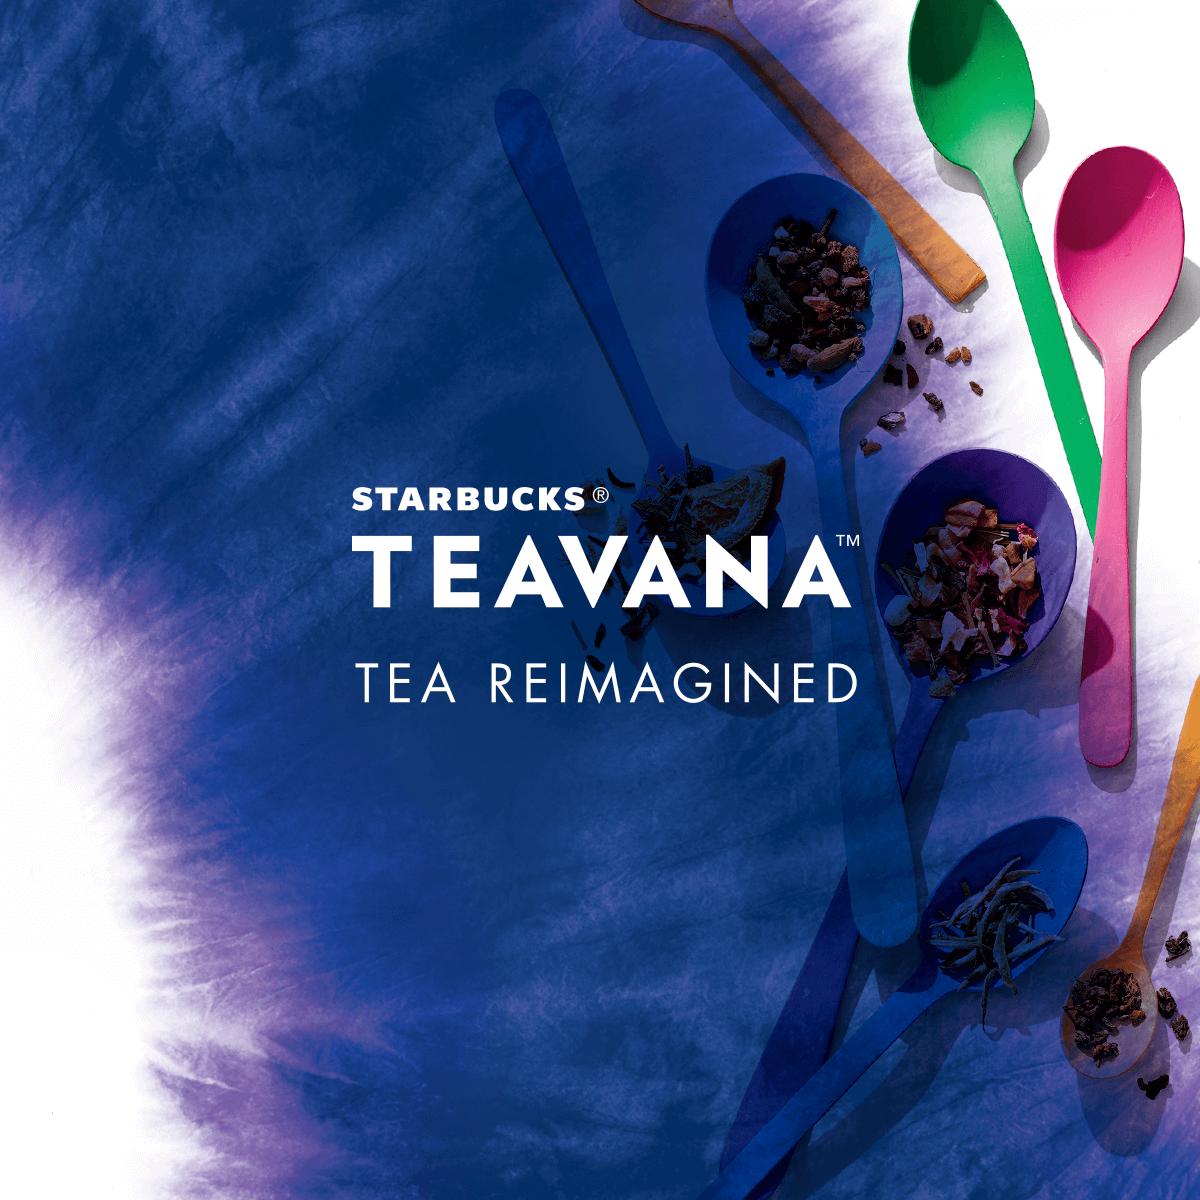 STARBUCKS® TEAVANA ™